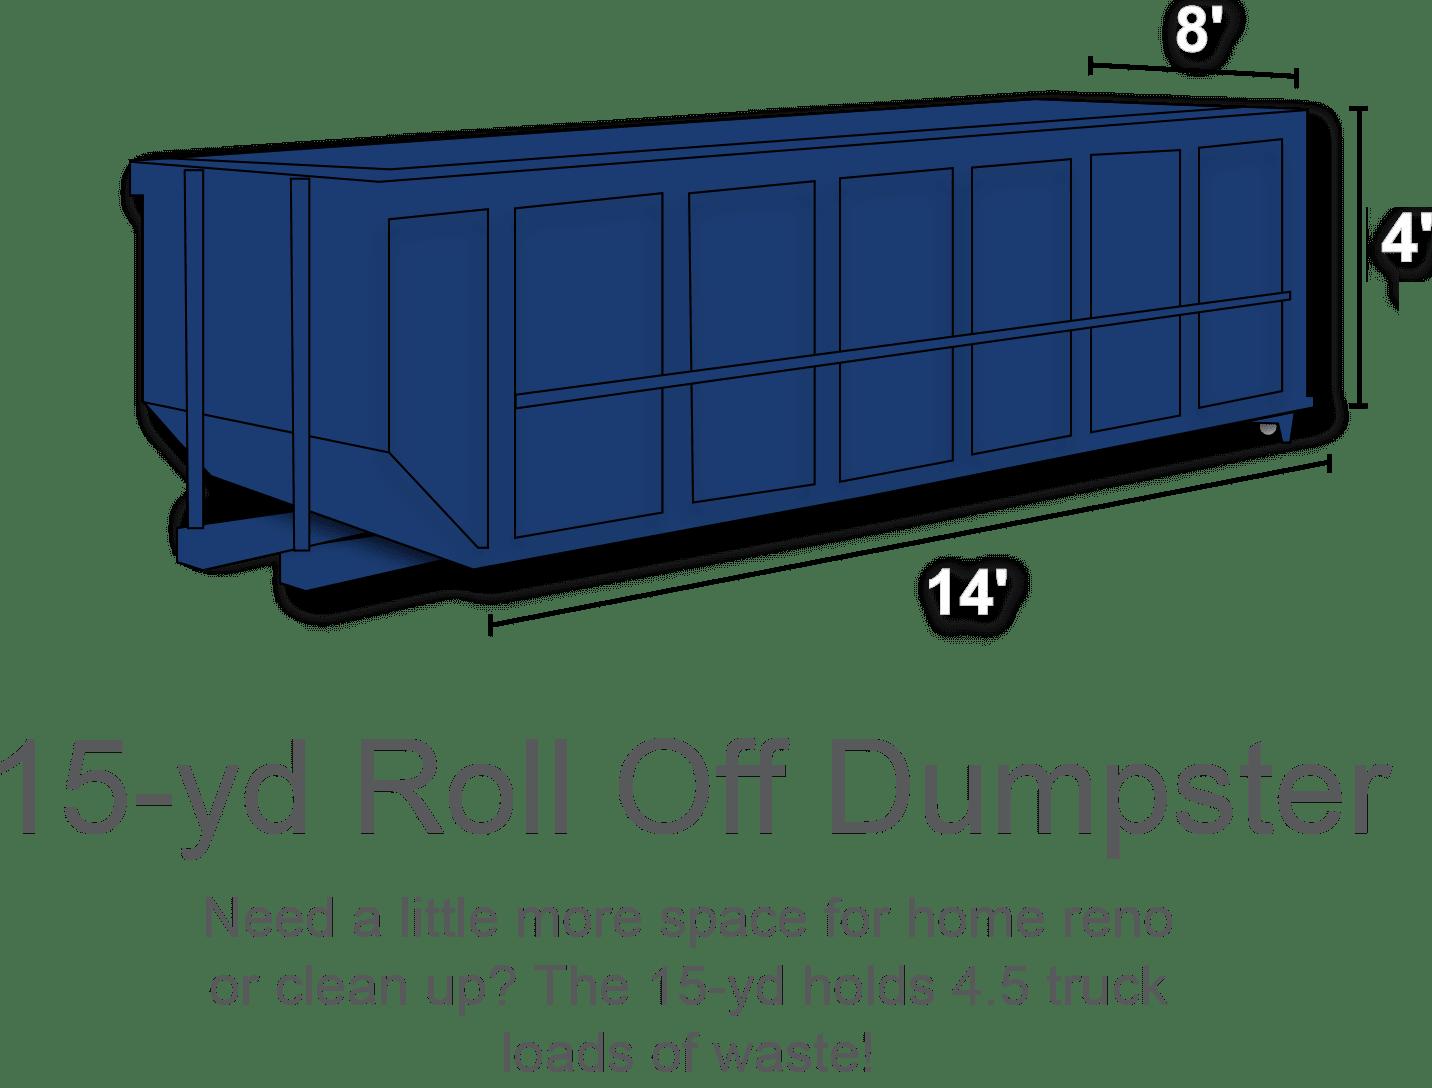 15 yard roll off dumpster rental